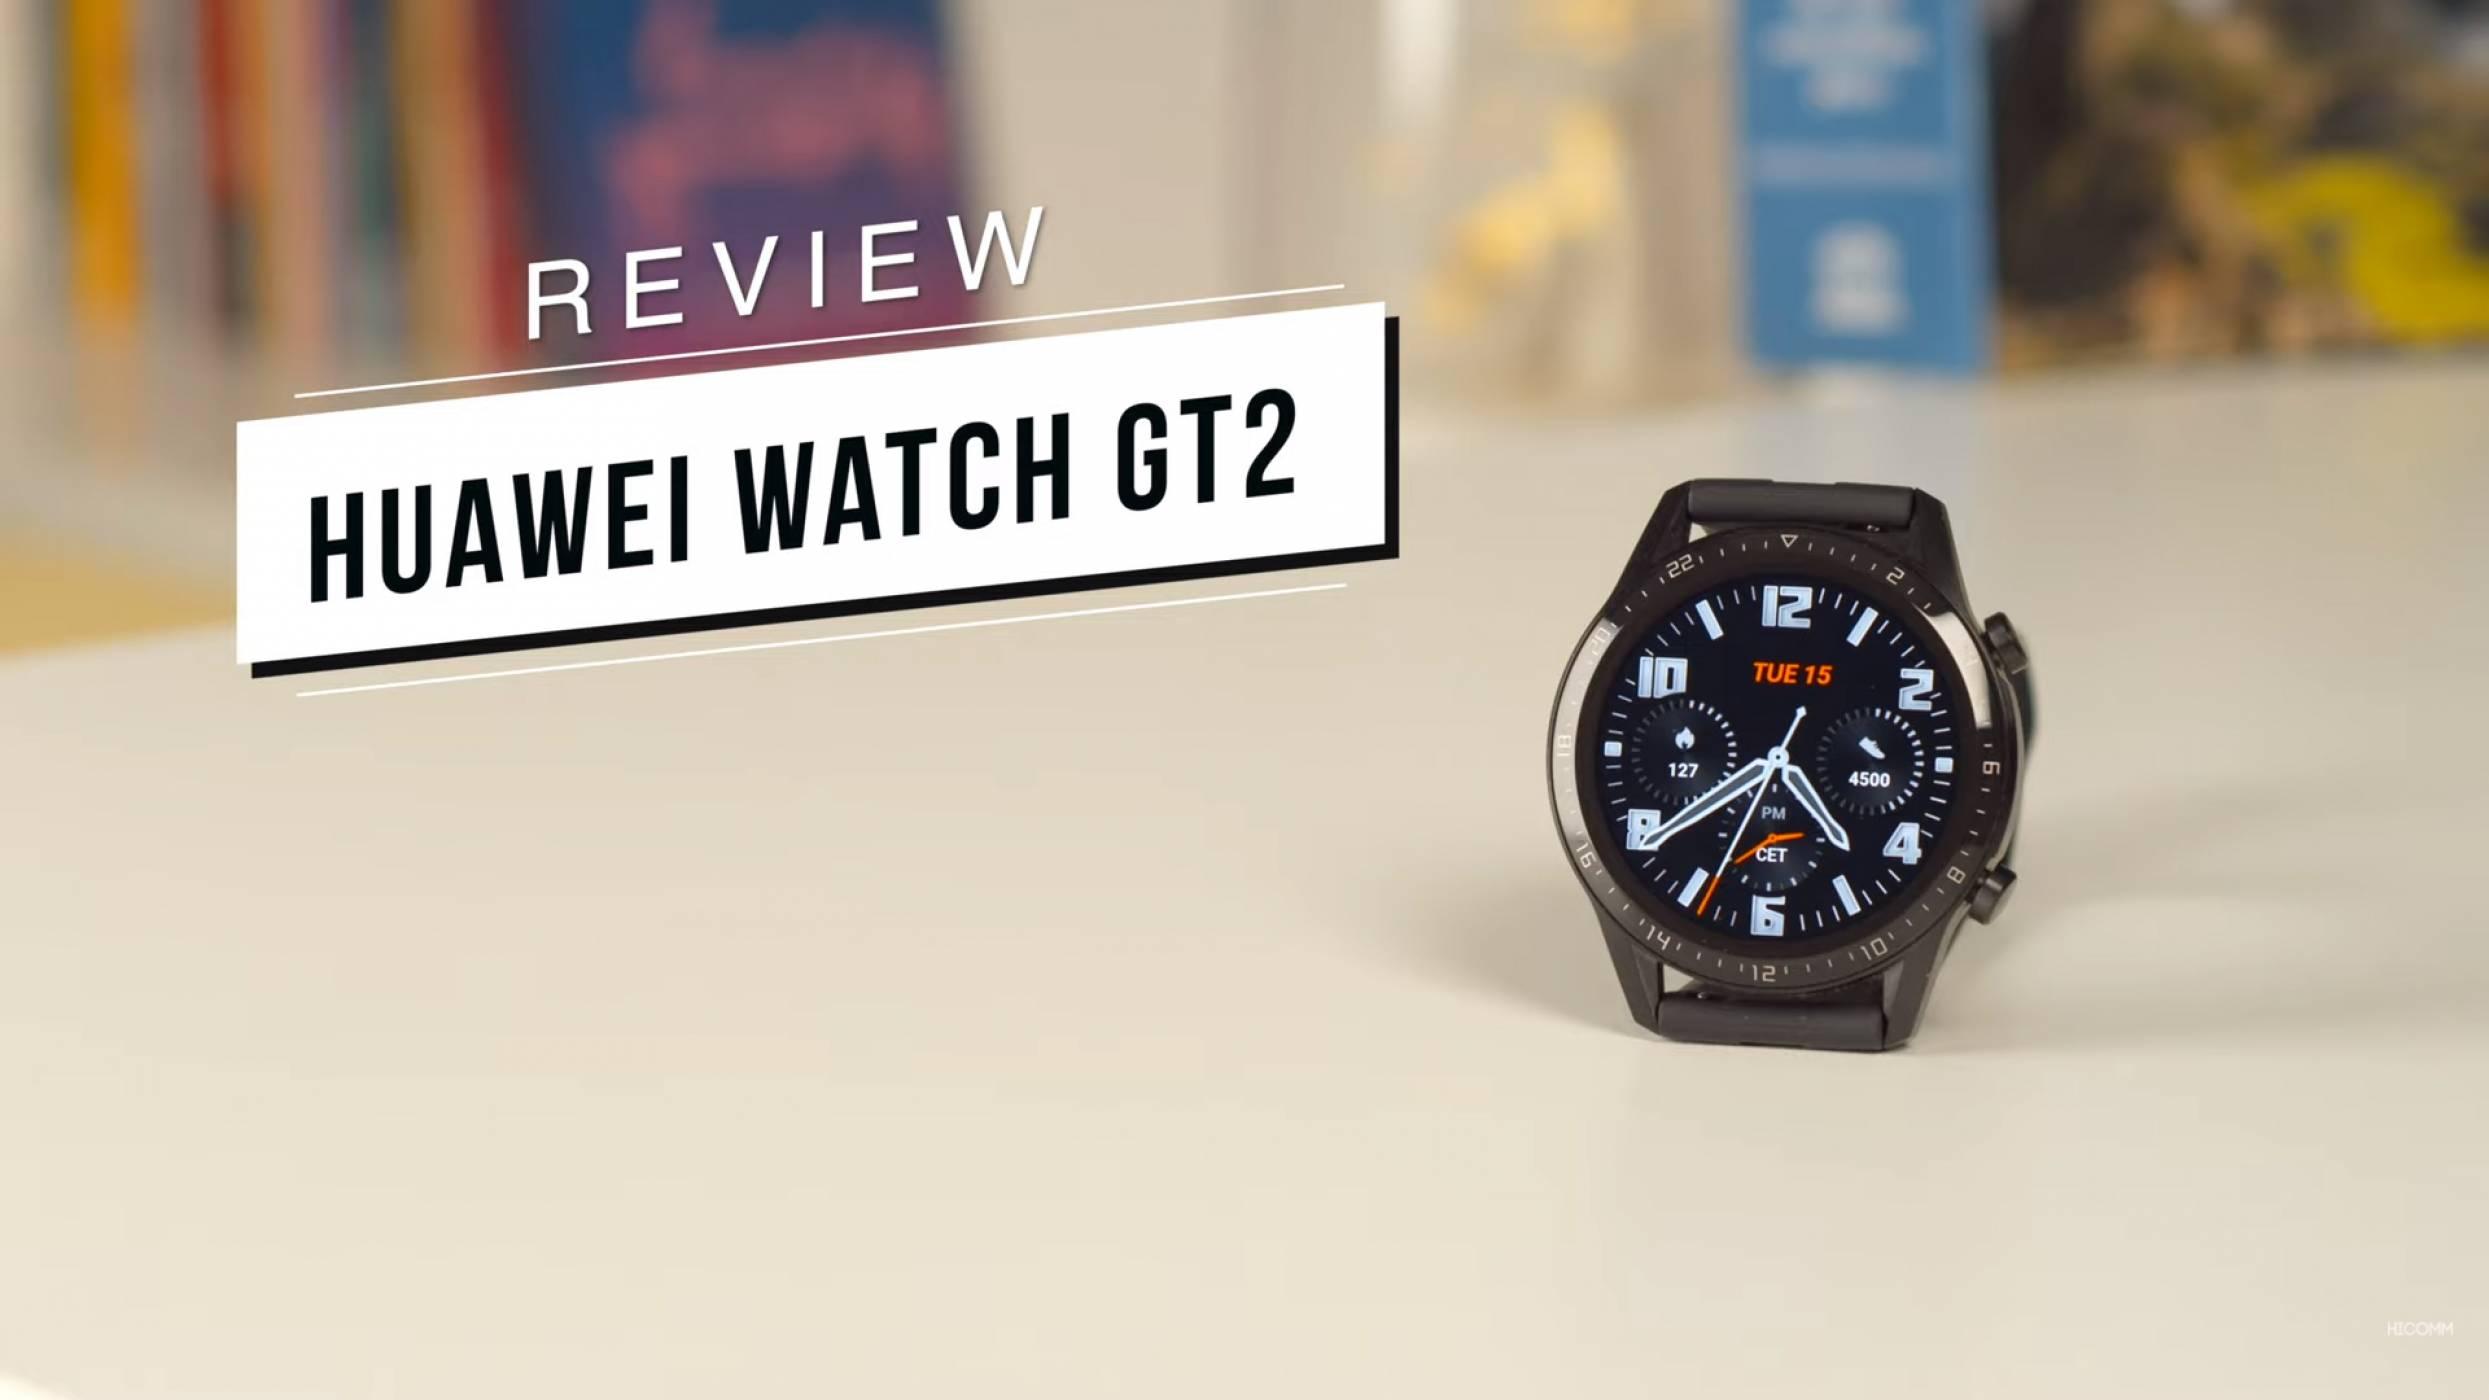 Усъвършенстван, удобен, издръжлив: Huawei Watch GT2 (Видео ревю)